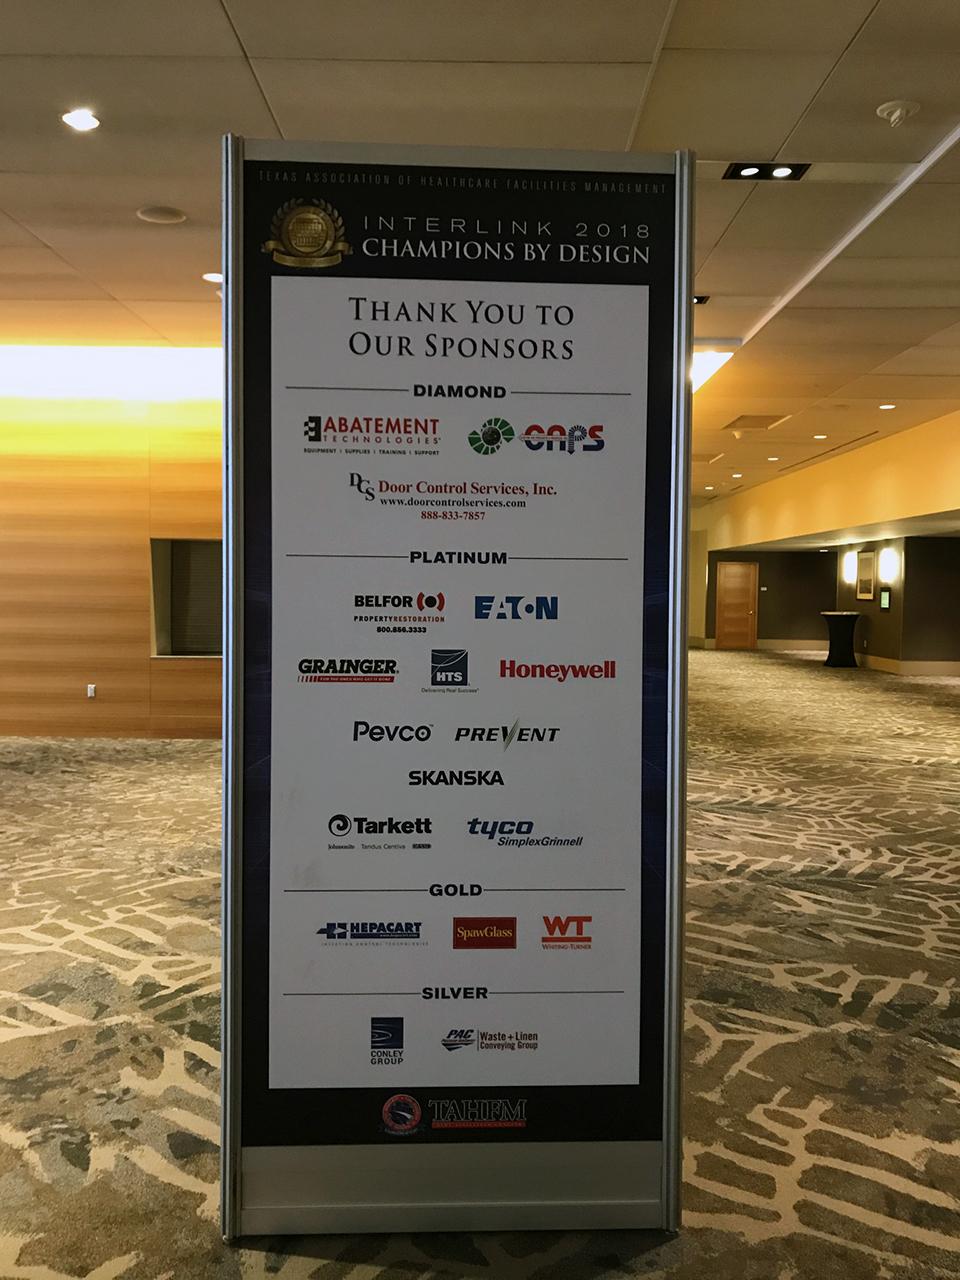 2018 Interlink Sponsors